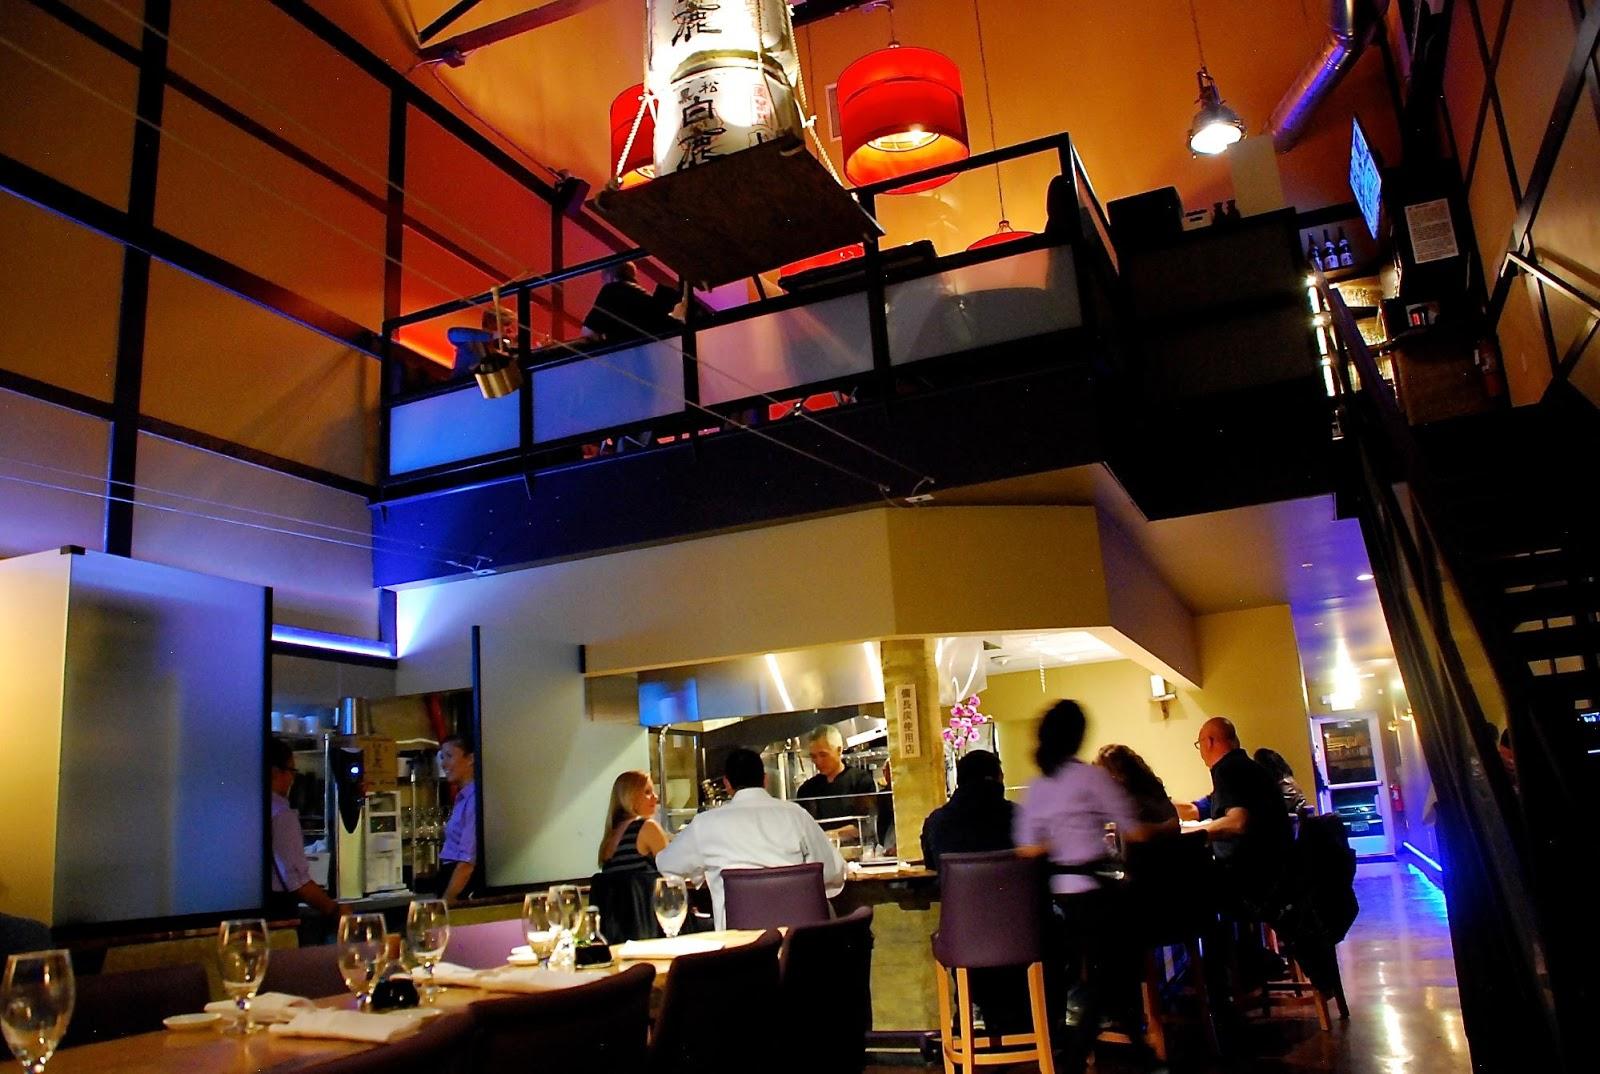 Go For Ramen Authentic Japanese Cuisine At New Denver